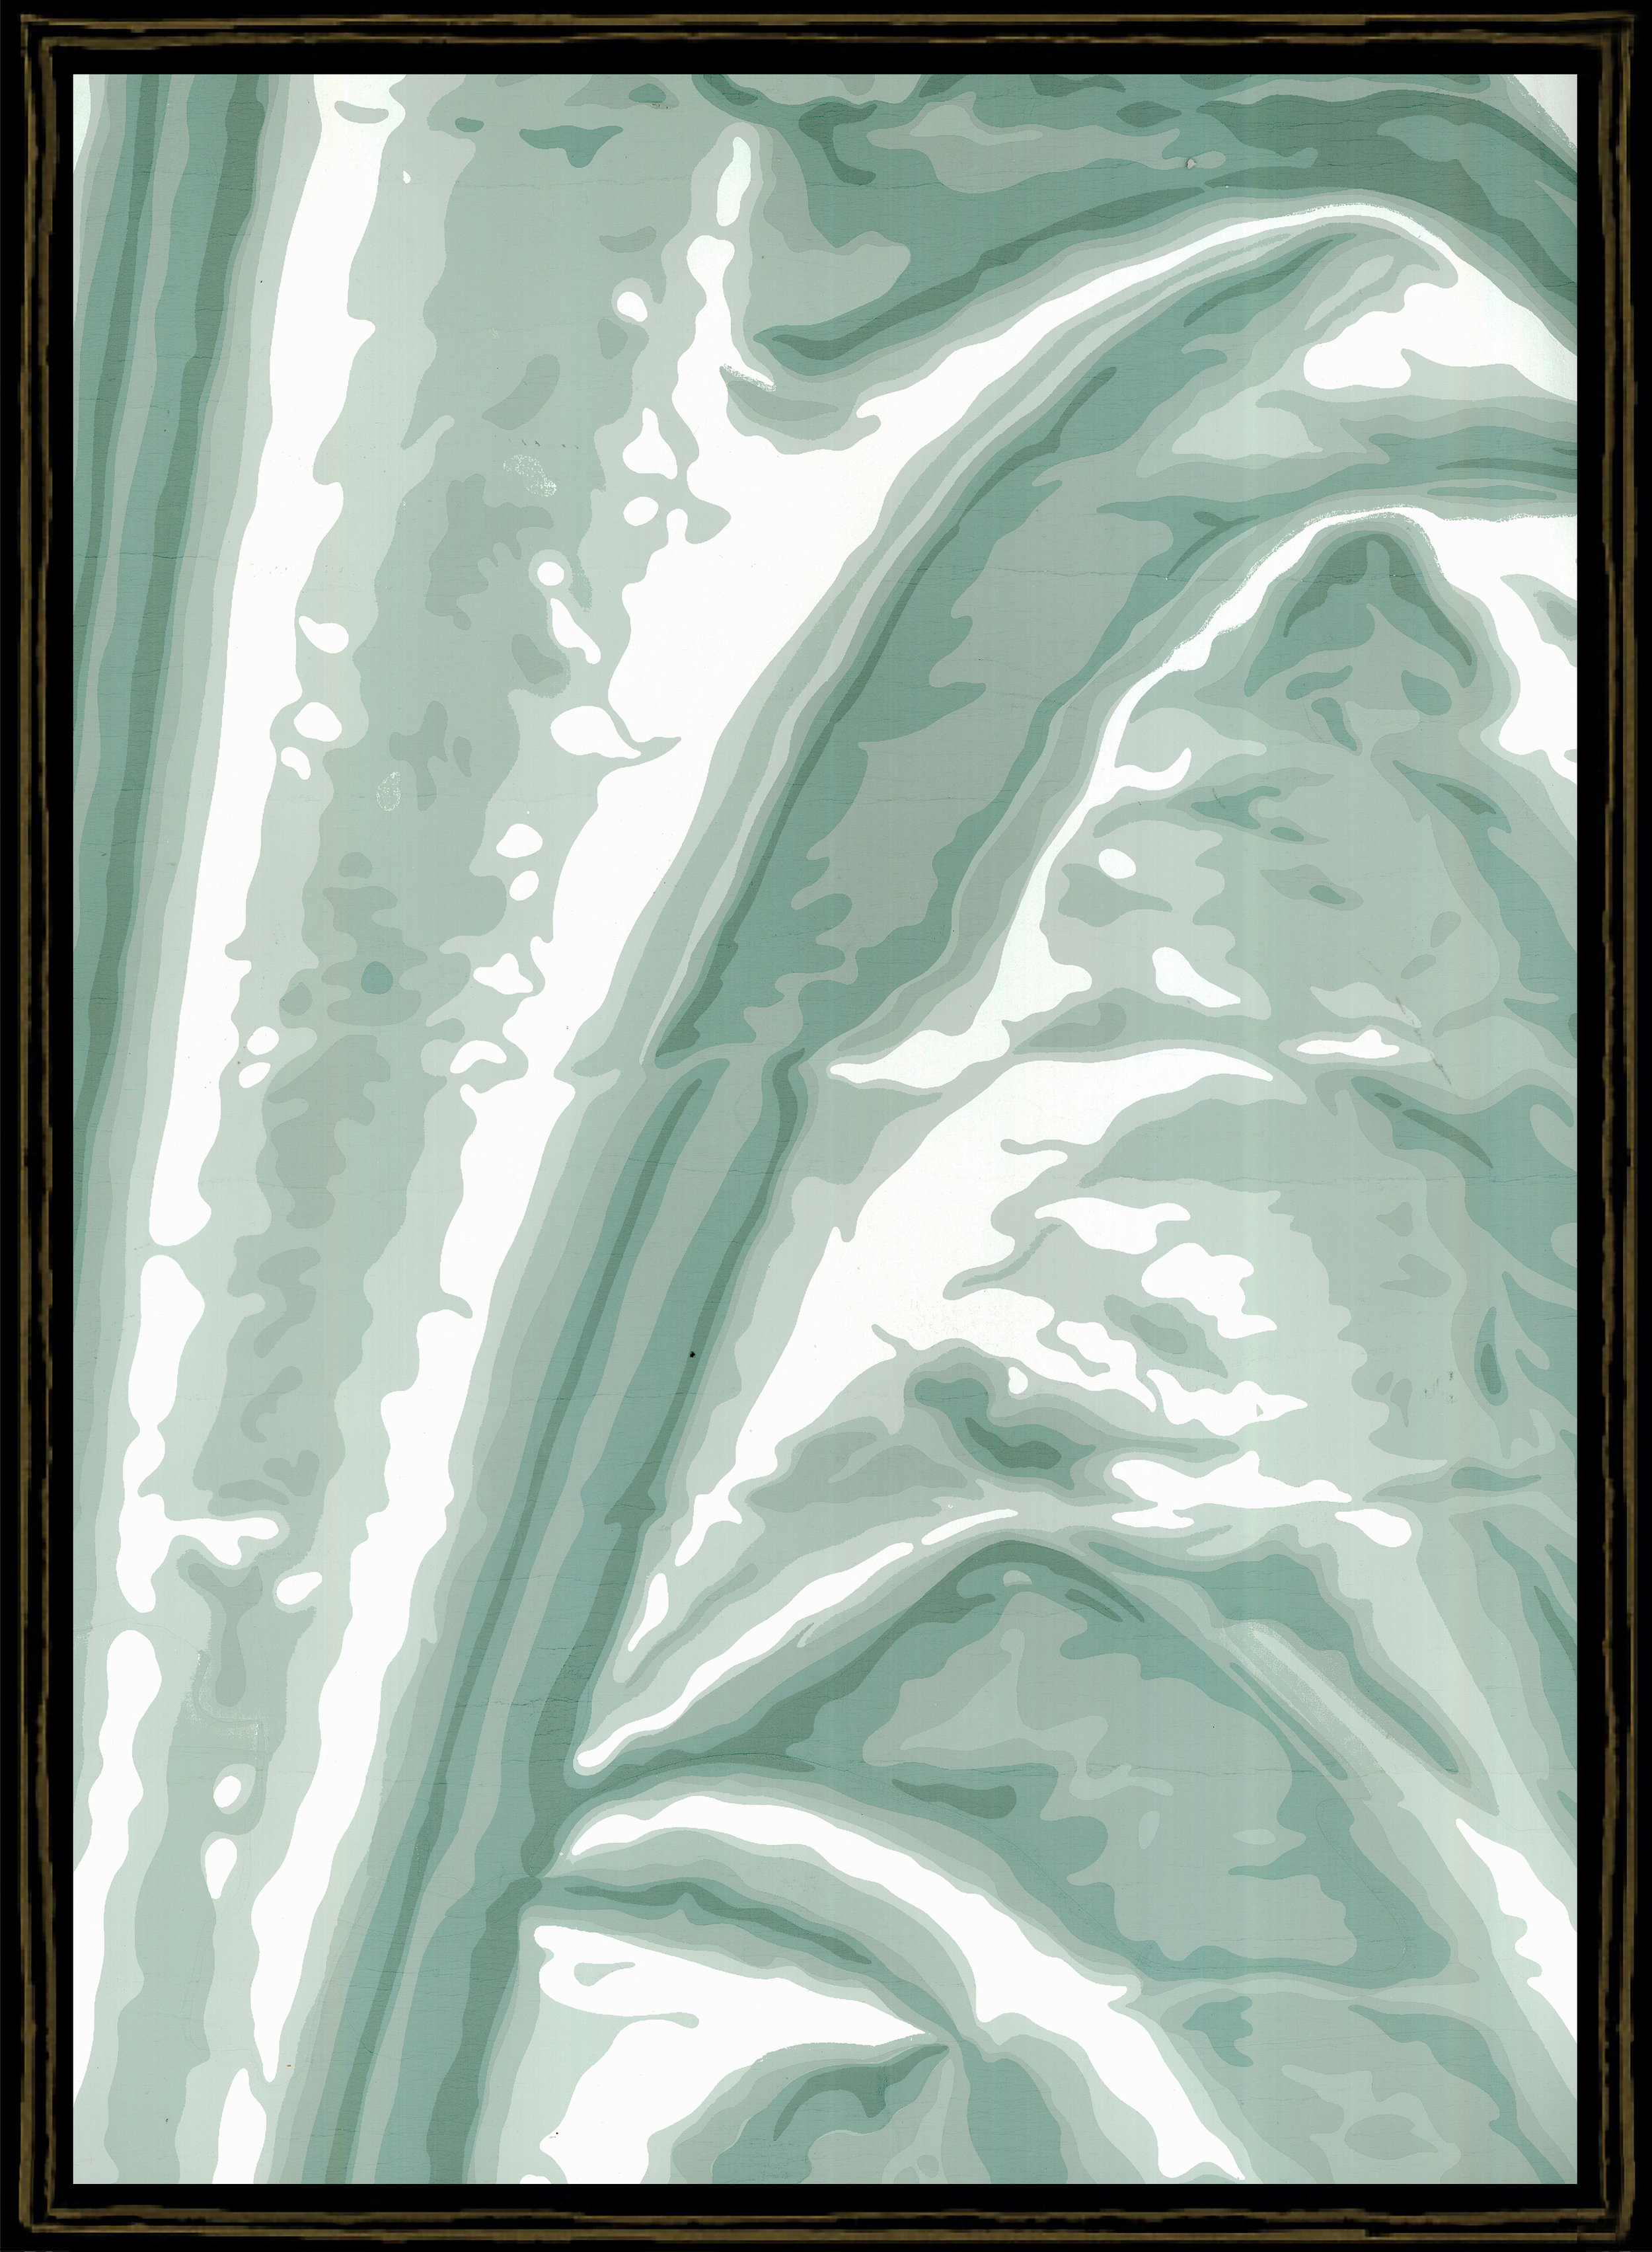 wallpaper 4.jpg